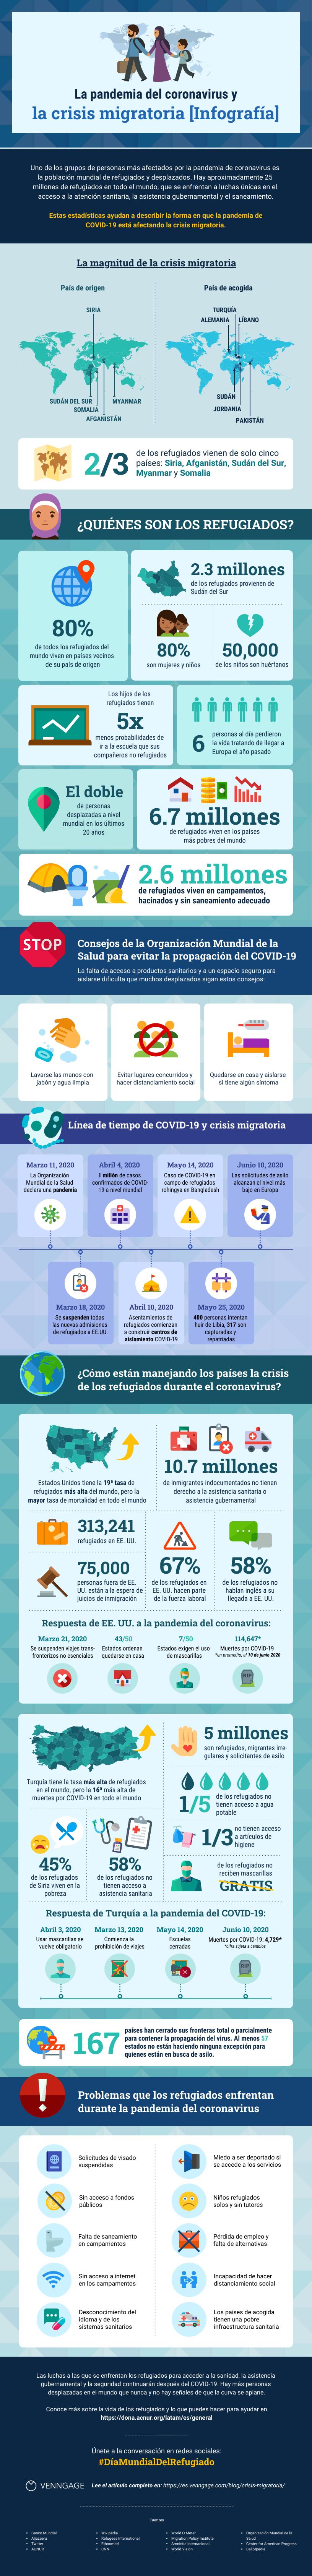 La pandemia del coronavirus y la crisis migratoria